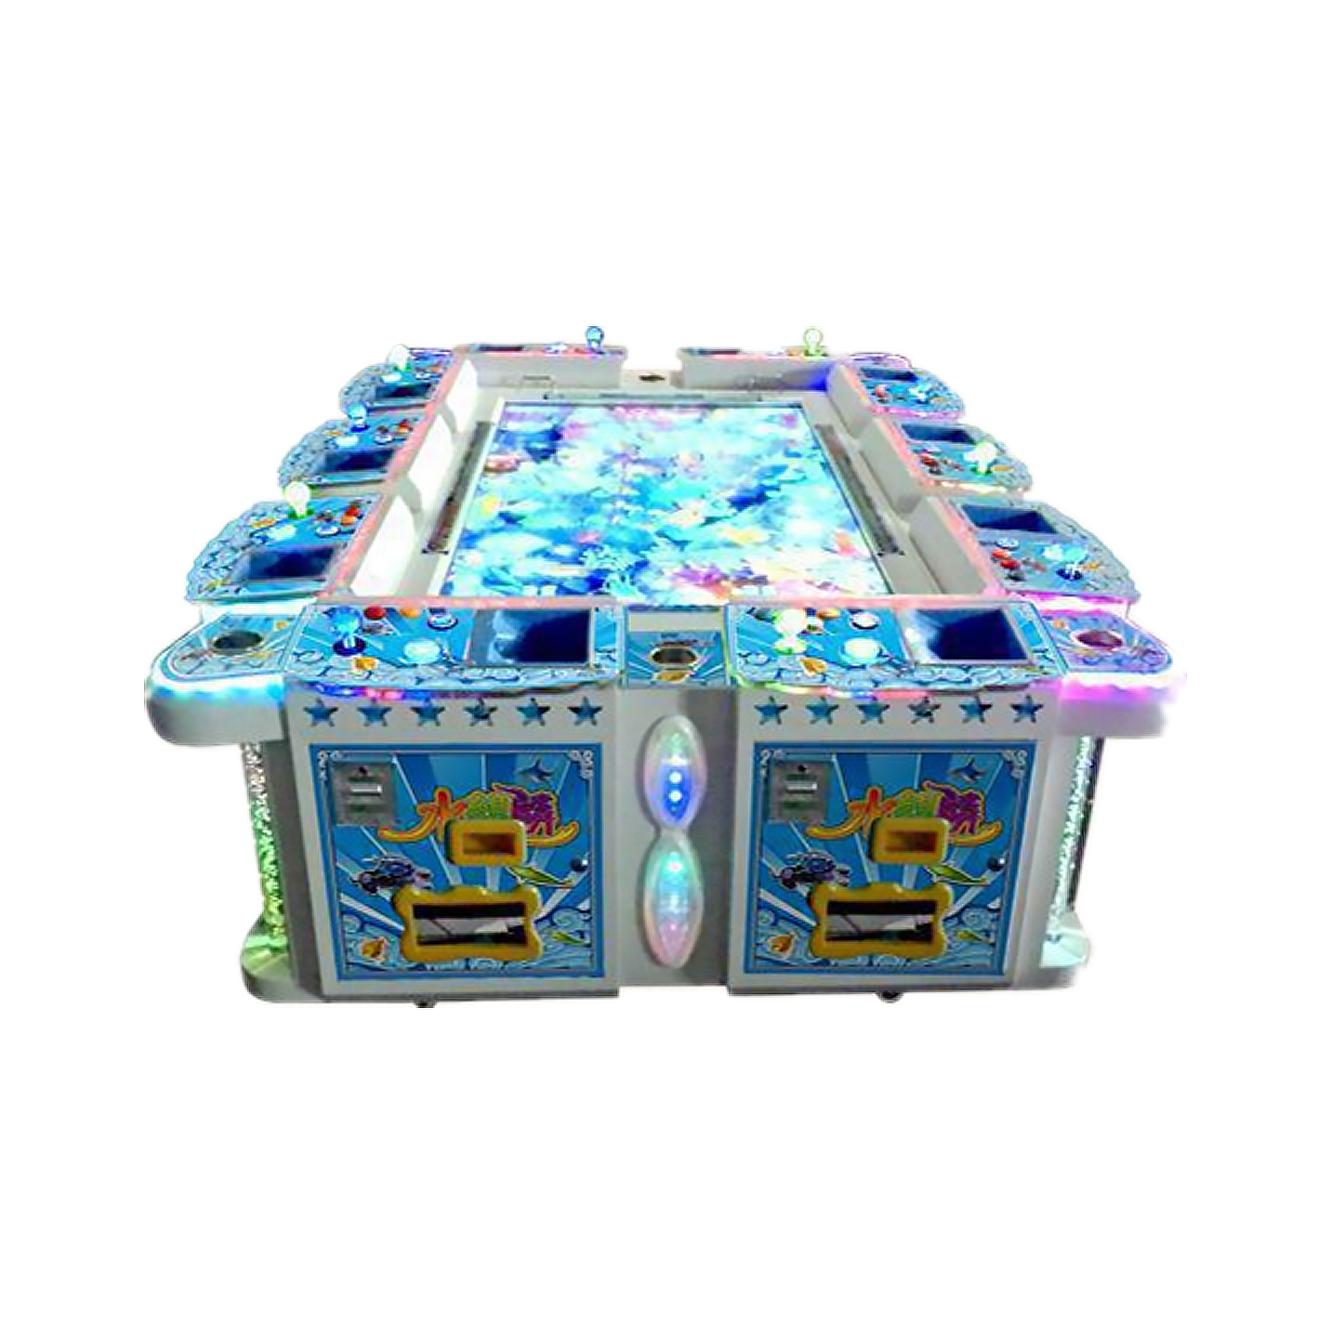 China Factory Supplier Children Park Amusement Arcade Fish